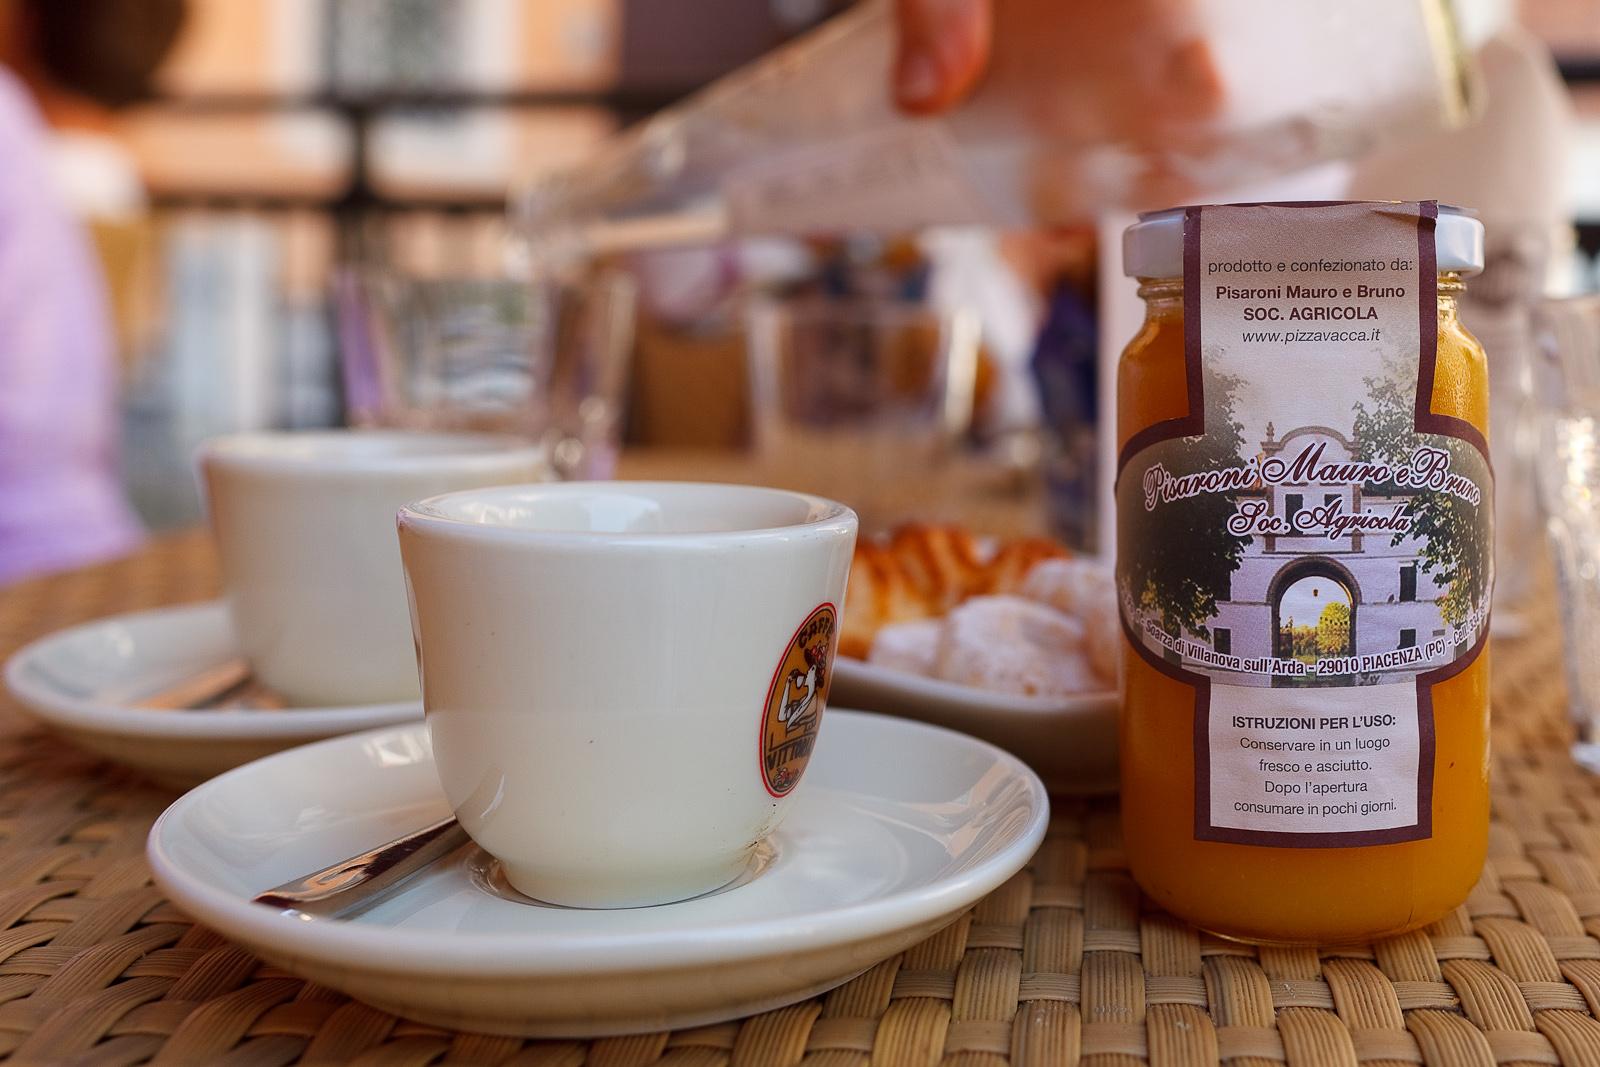 Espresso and Pisaroni Mauro e Bruno Orange Juice